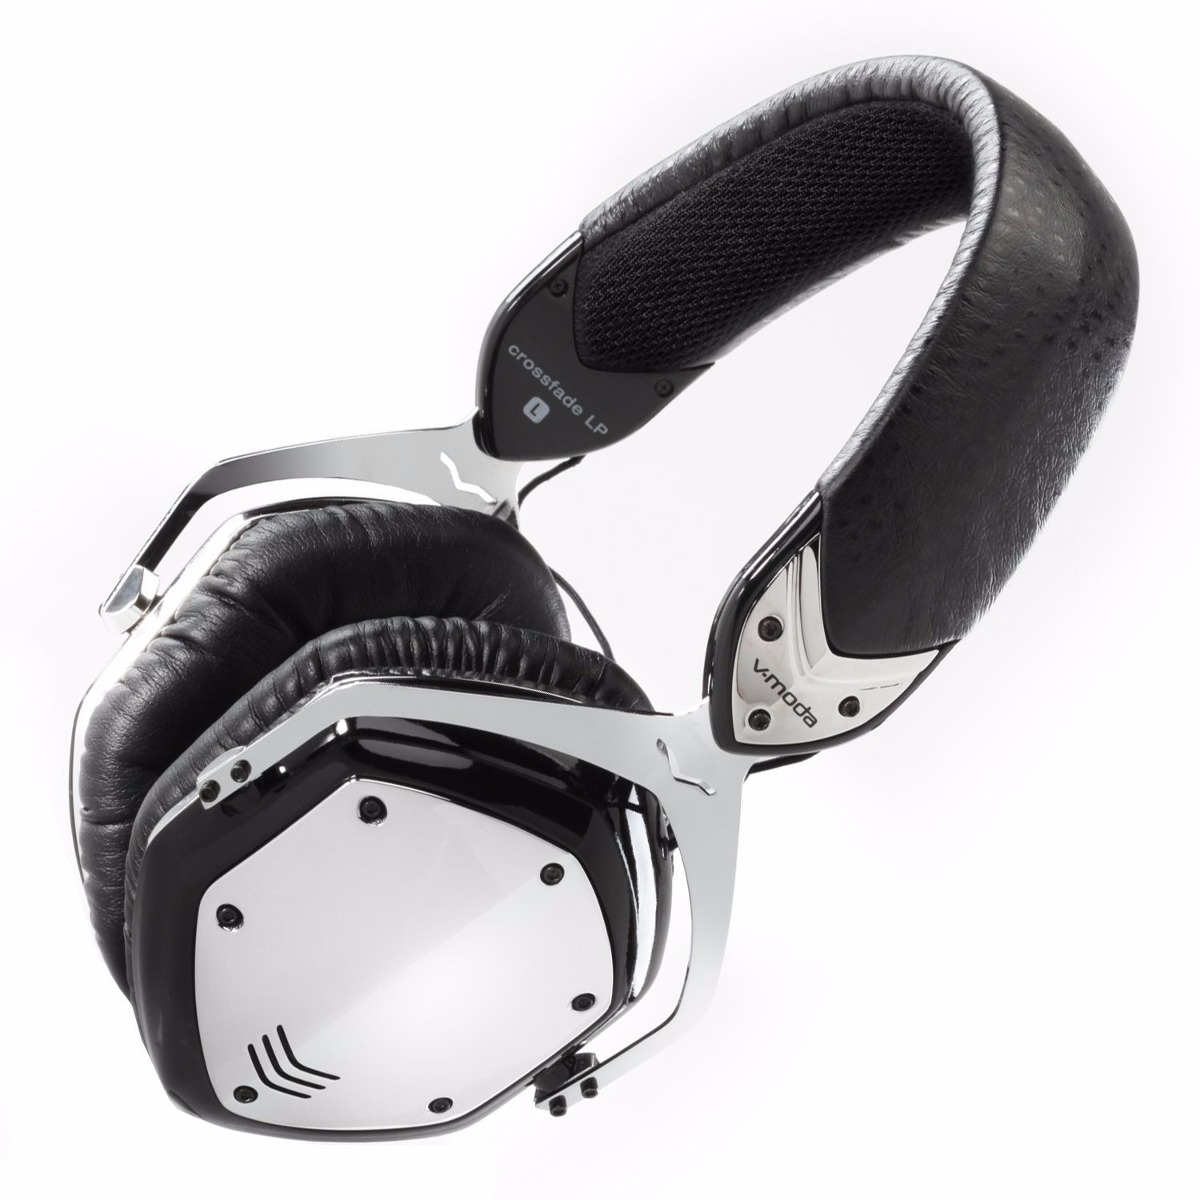 Noise isolating ear plugs quies